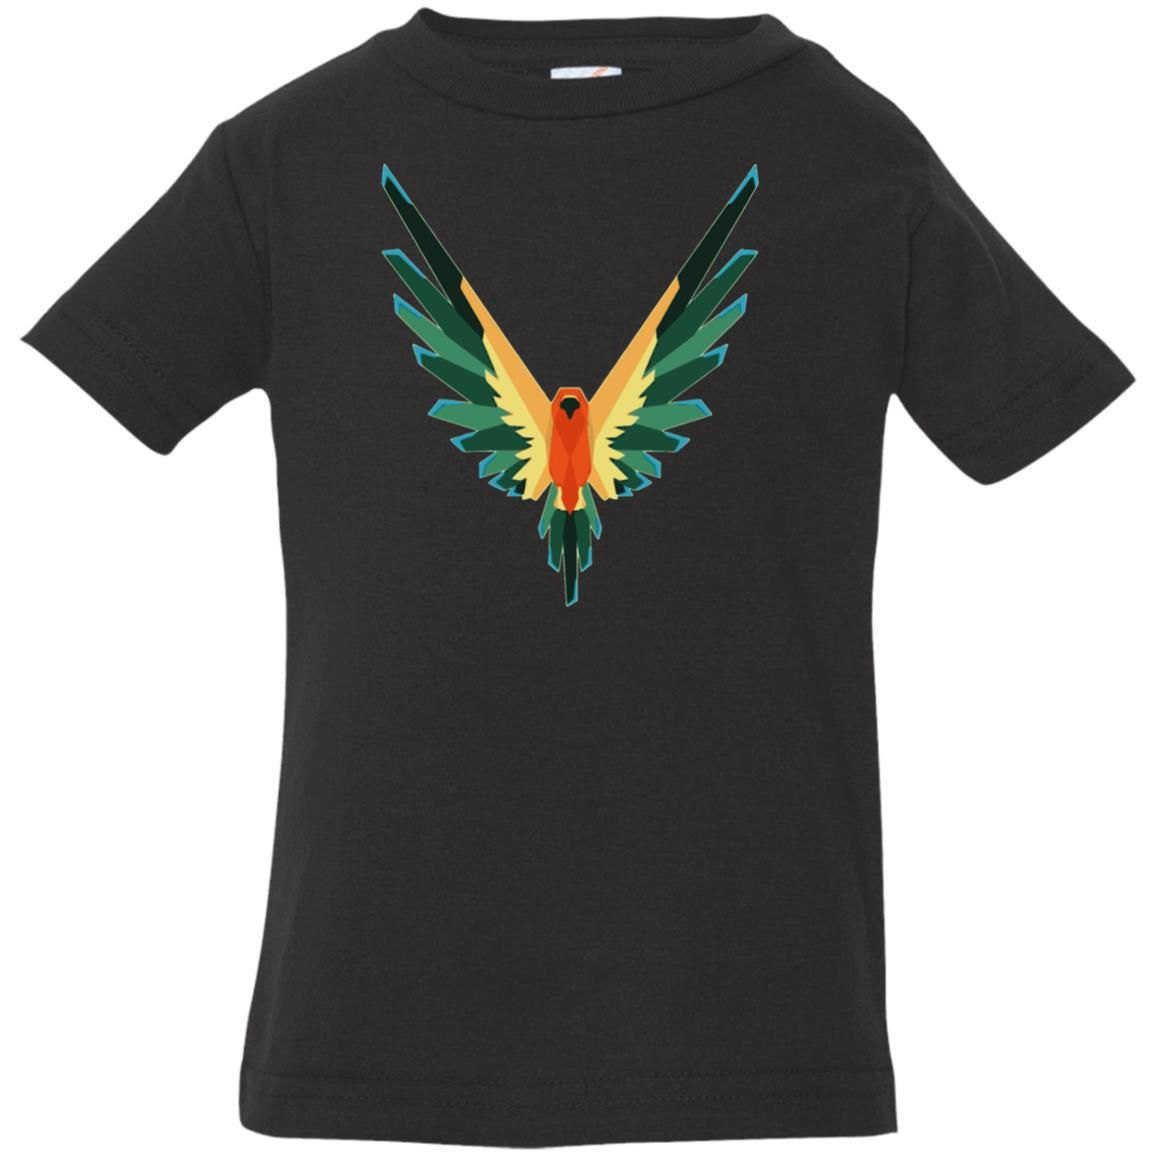 image 1241 - Logan Paul Maverick kid shirt & sweatshirt